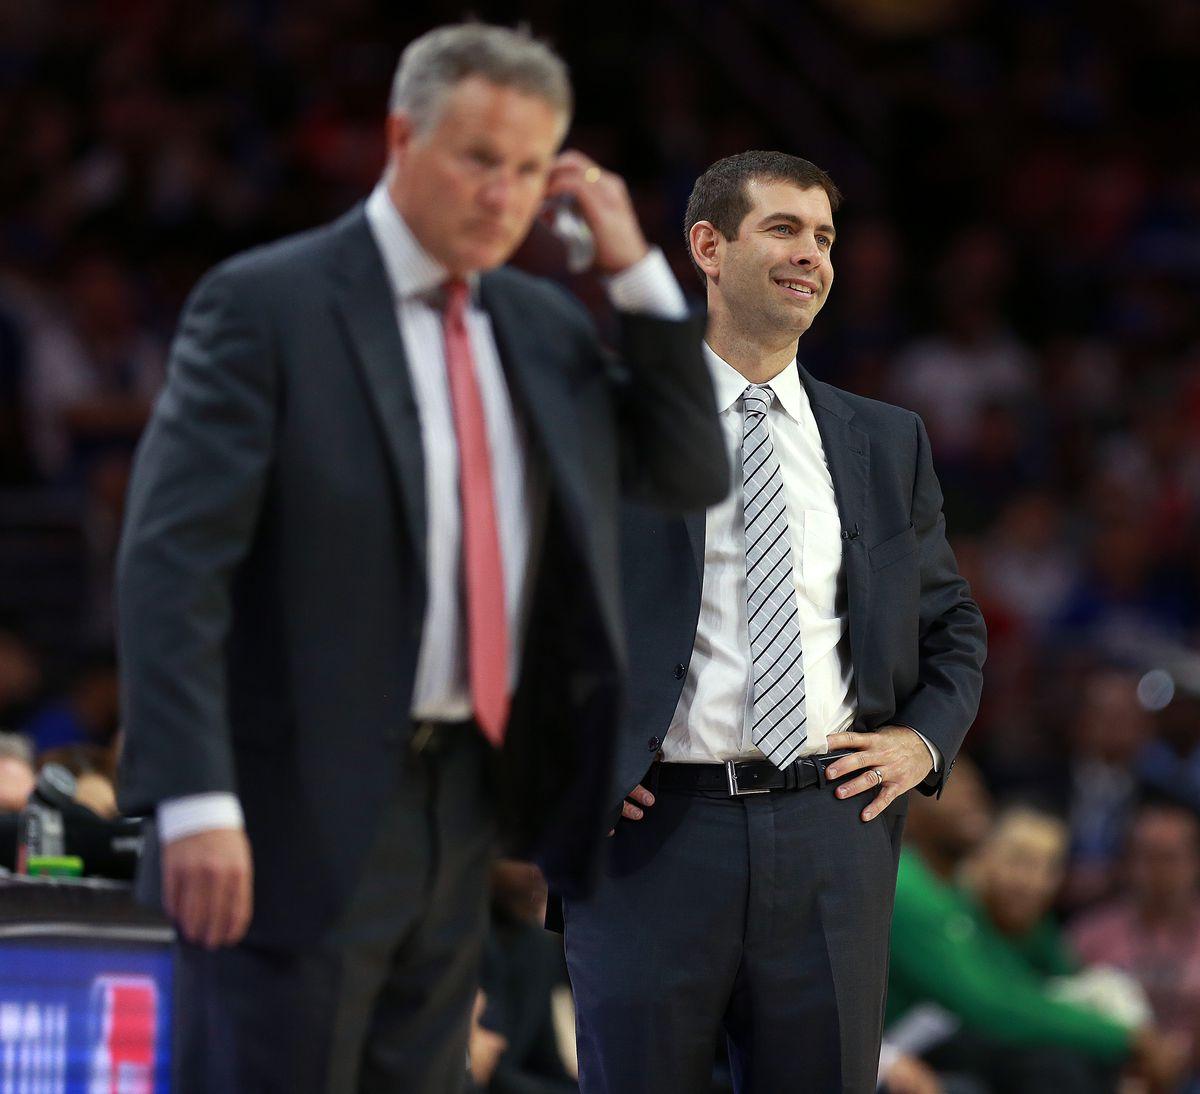 2018 NBA Playoffs: Boston Celtics vs Philadelphia 76ers At Wells Fargo Center